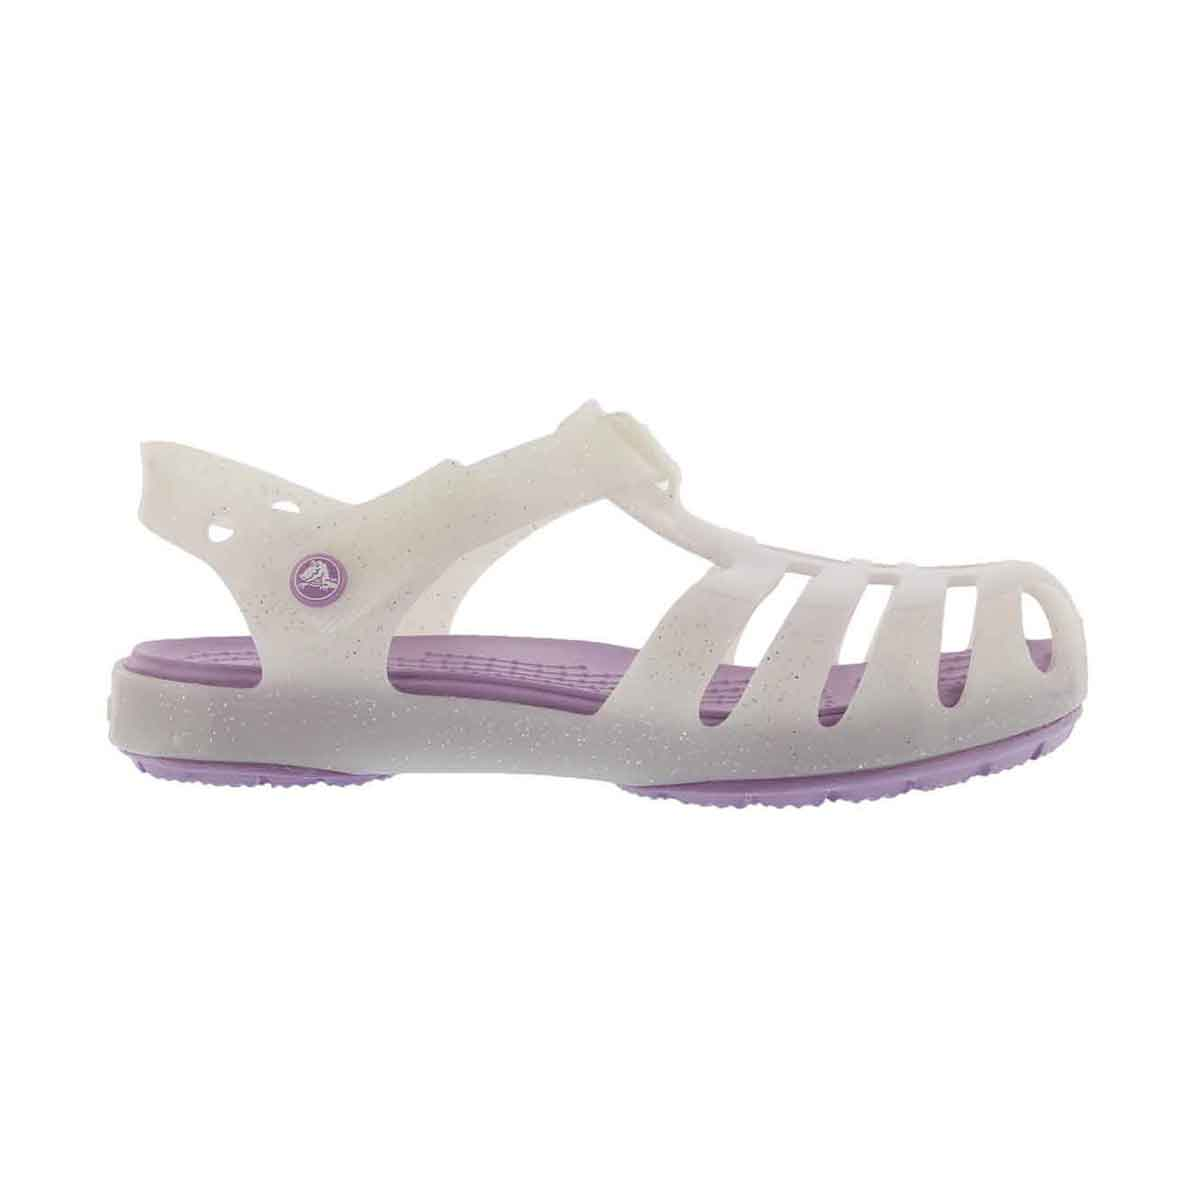 Grls Isabella white casual sandal